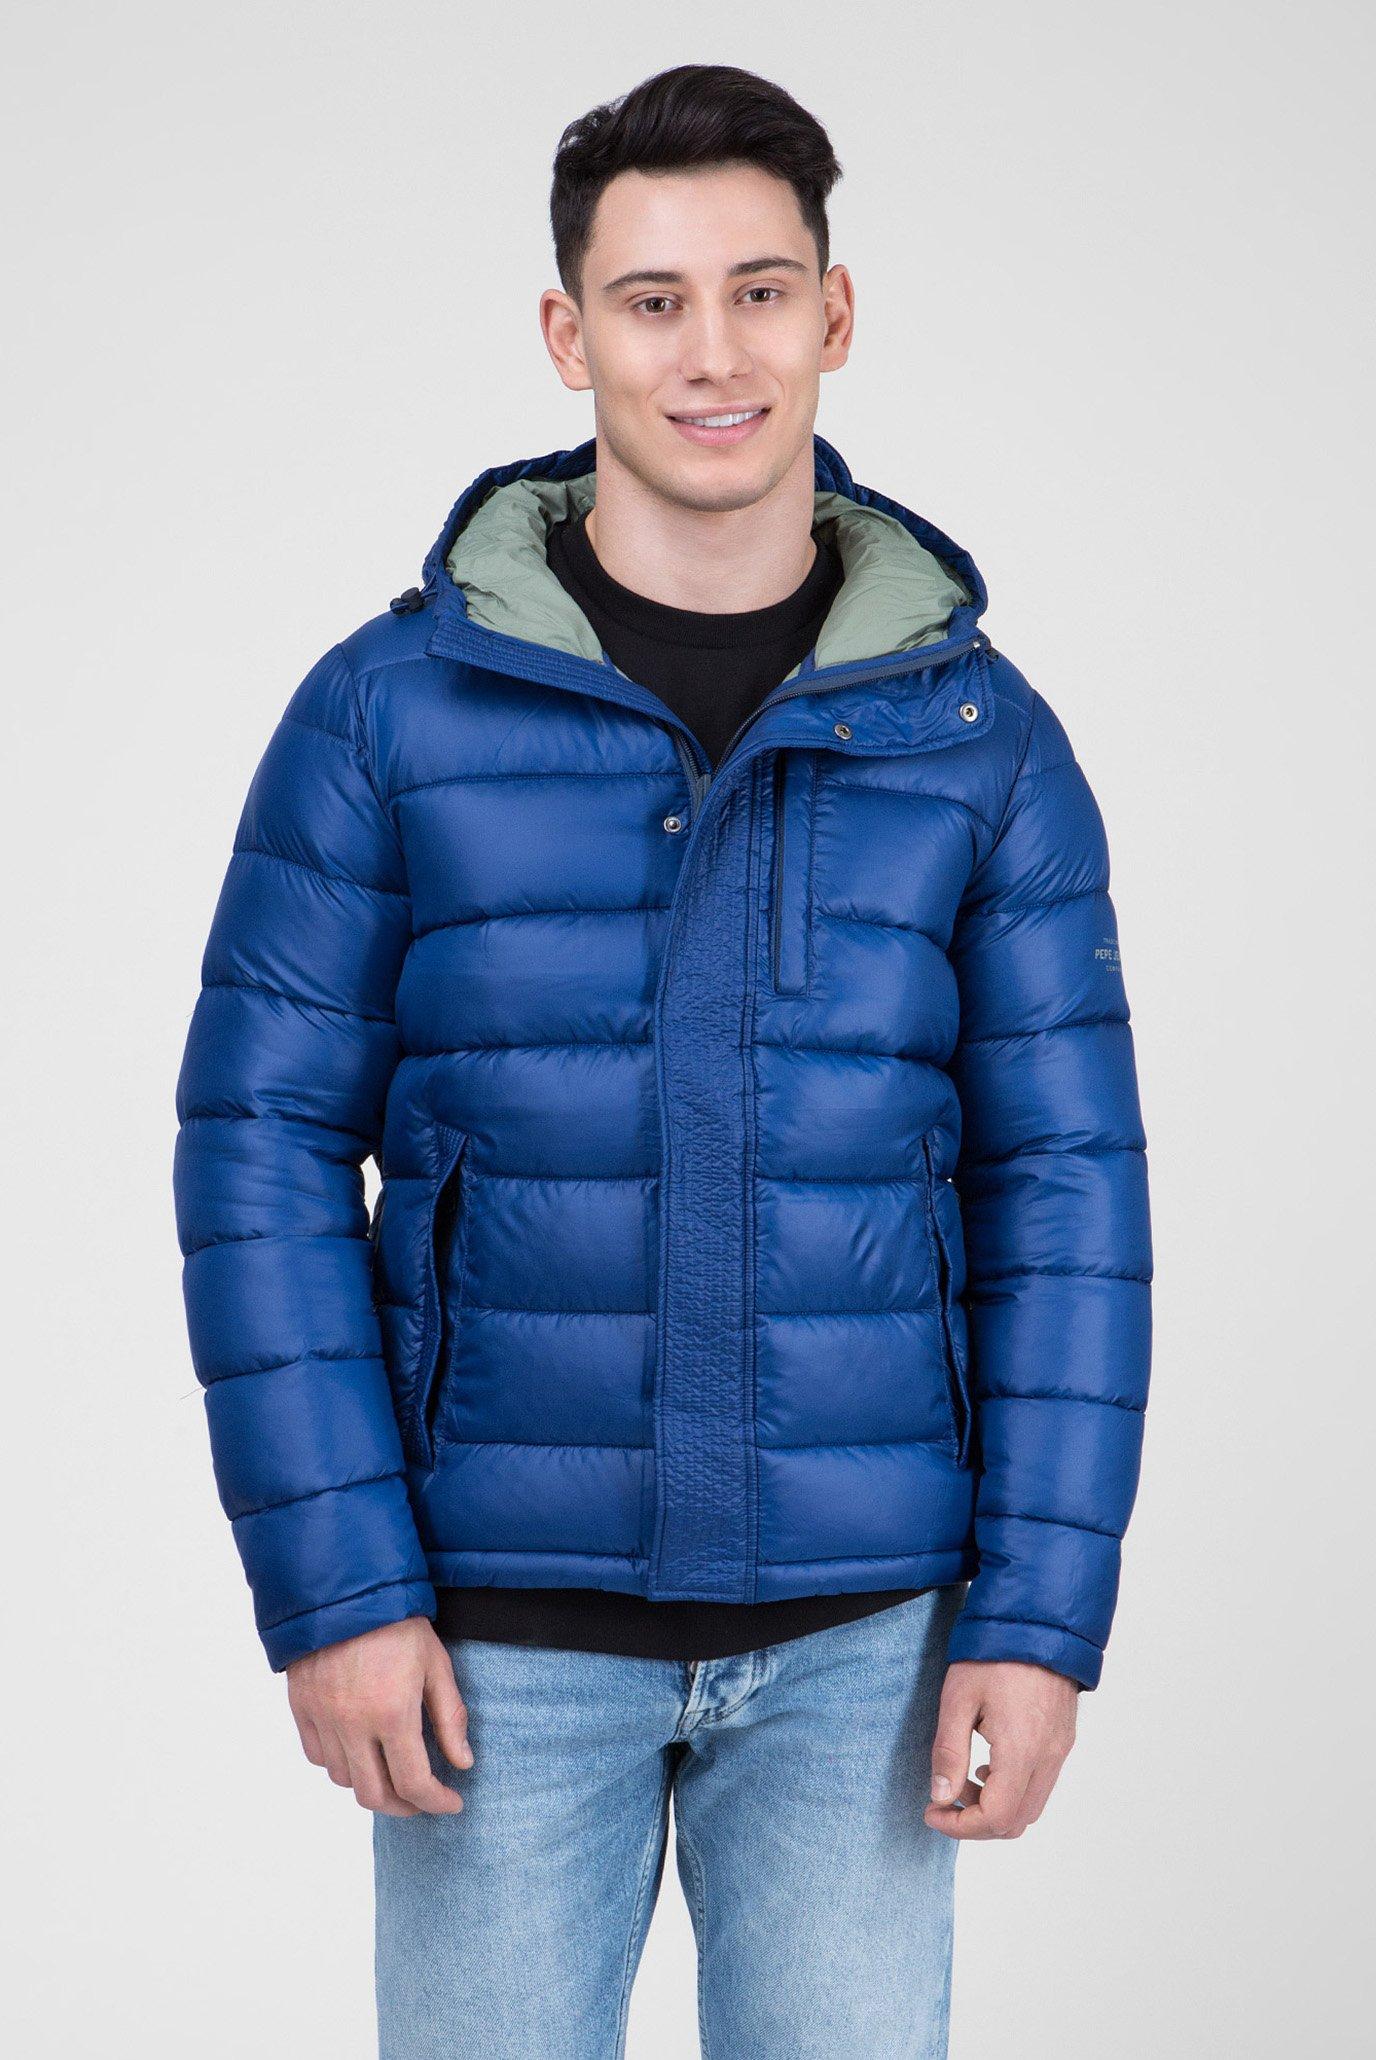 Купить Мужская синяя куртка WALBROOKS Pepe Jeans Pepe Jeans PM401928 – Киев, Украина. Цены в интернет магазине MD Fashion